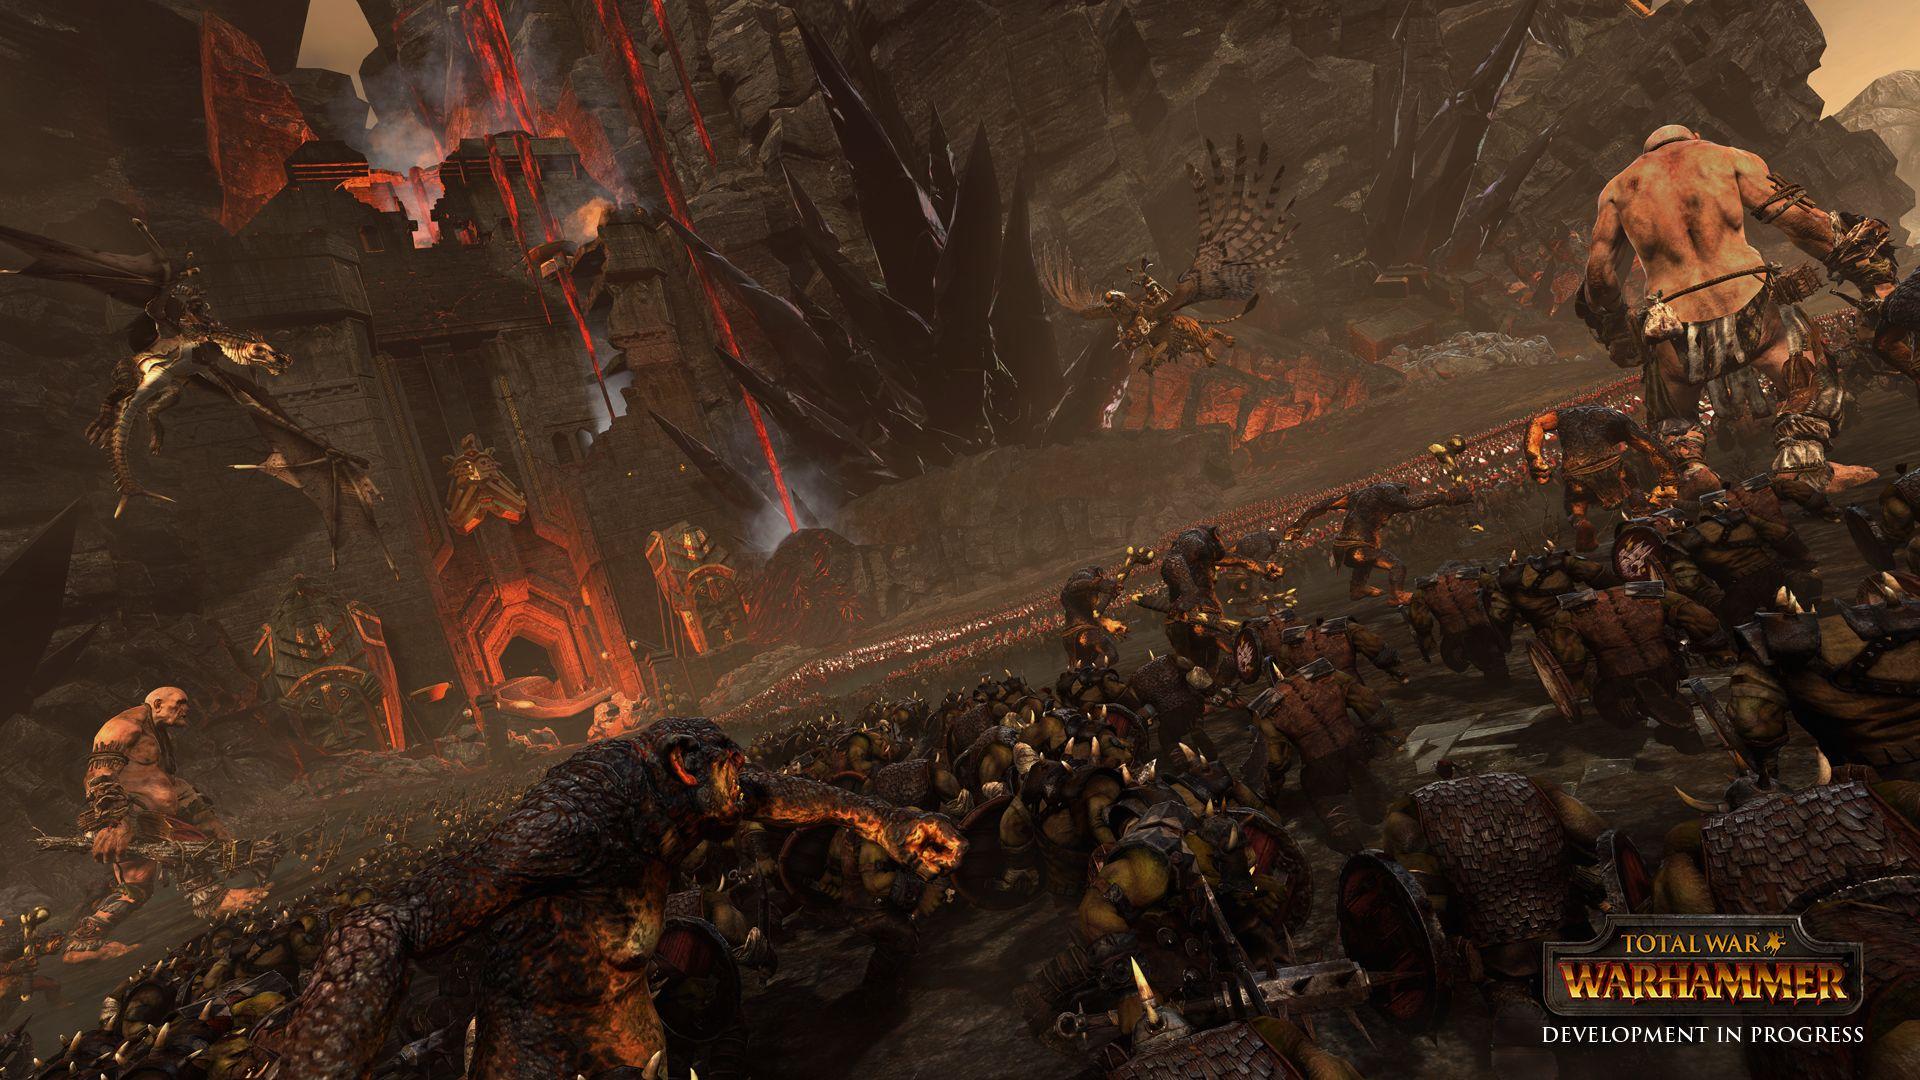 Bitva v Blackfire průsmyku z Total War: Warhammer 109637